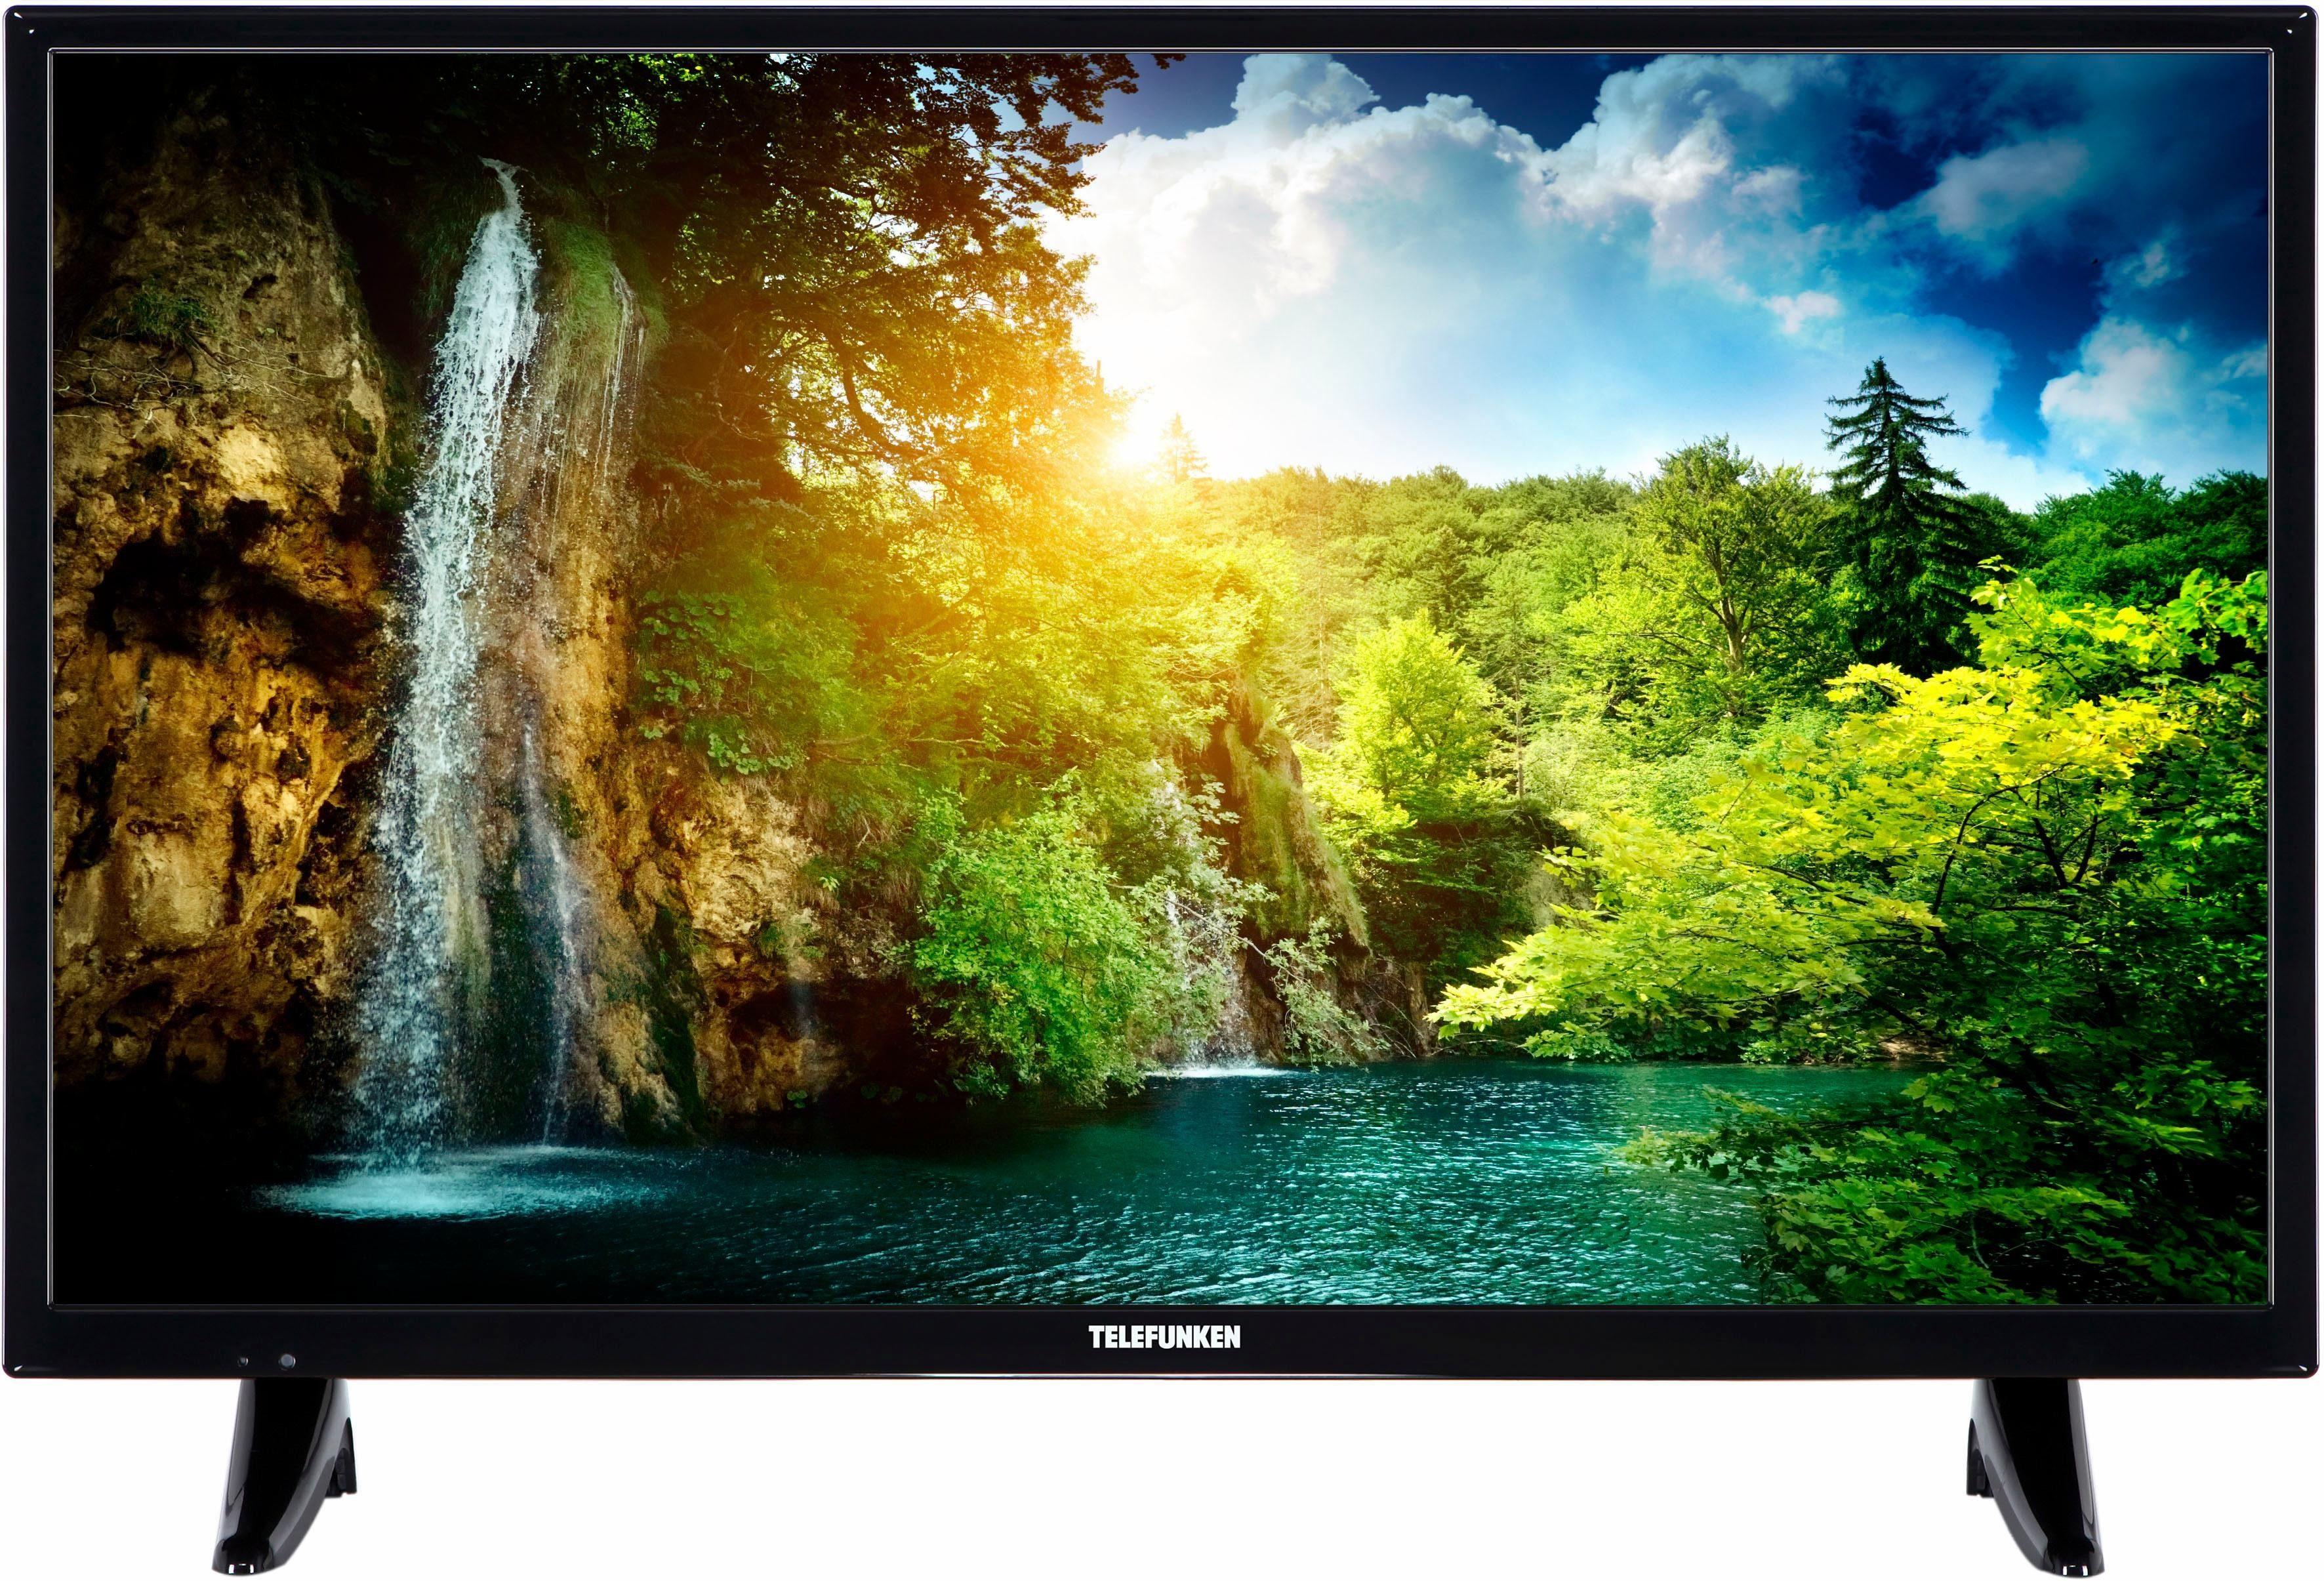 Telefunken D32H287M4CW LED-Fernseher (80 cm/32 Zoll, HD-ready, Smart-TV)